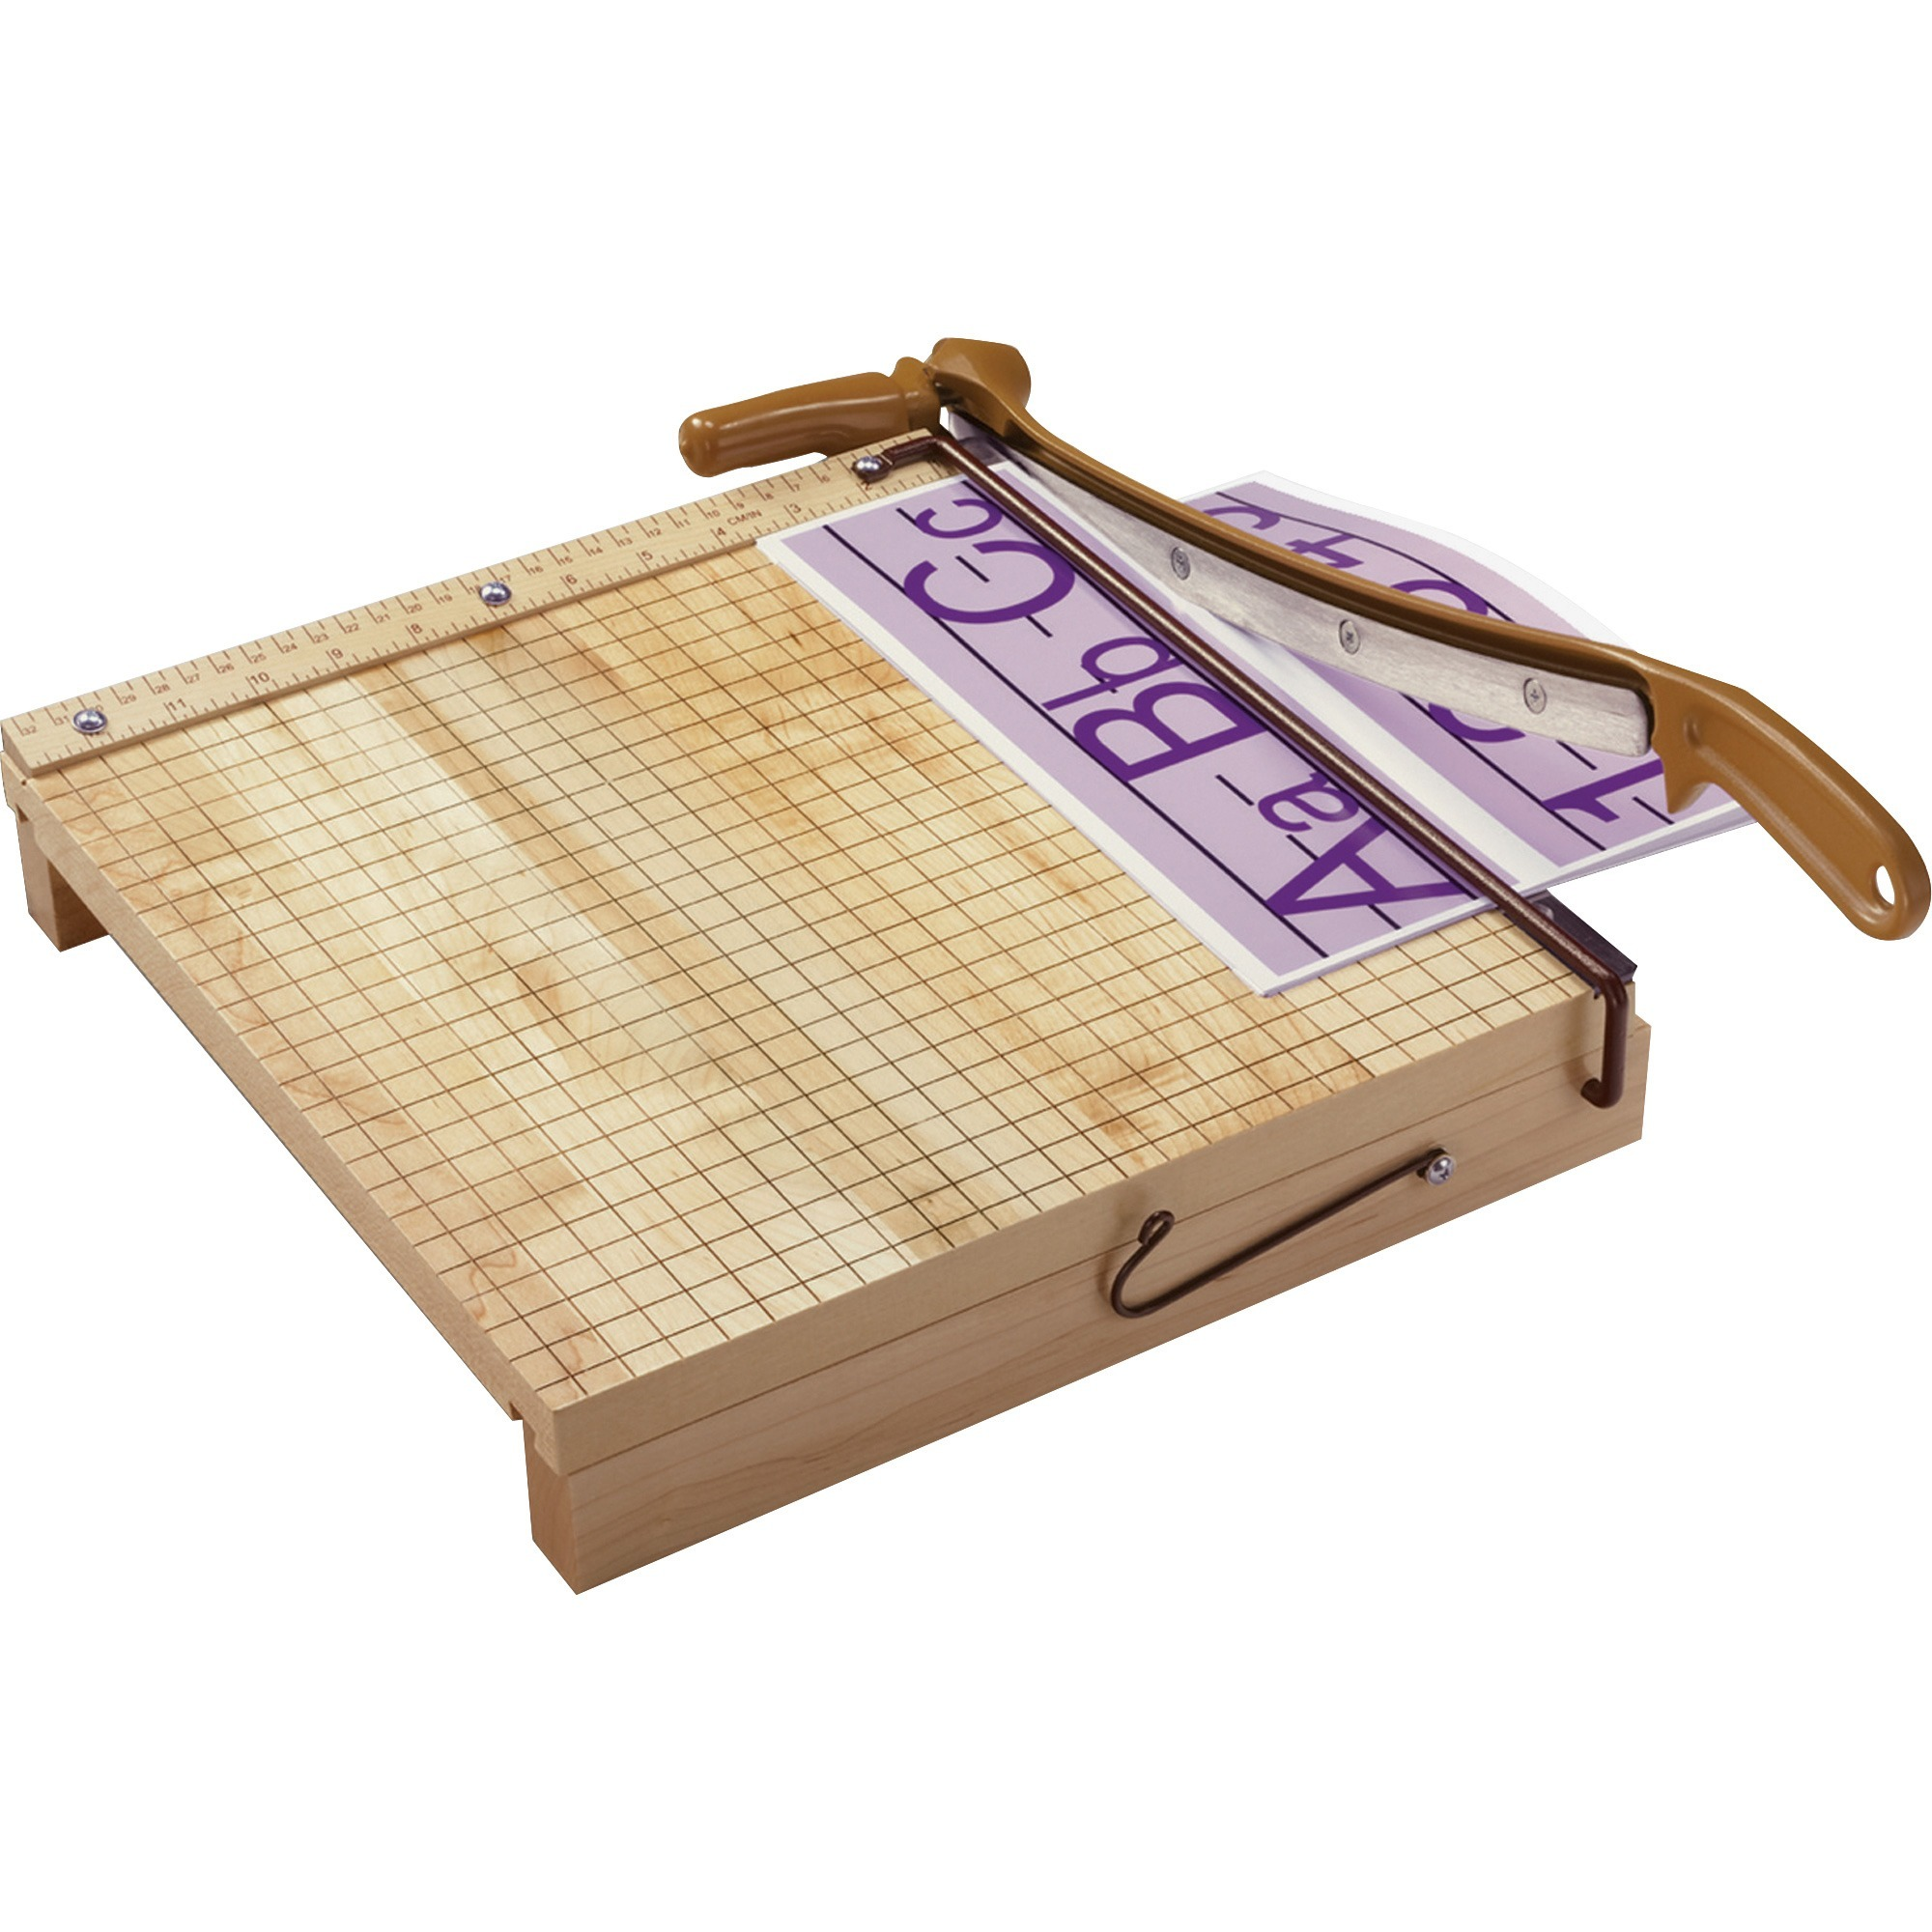 "Swingline ClassicCut Ingento 12"" Square Paper Trimmer, Solid Maple Base"